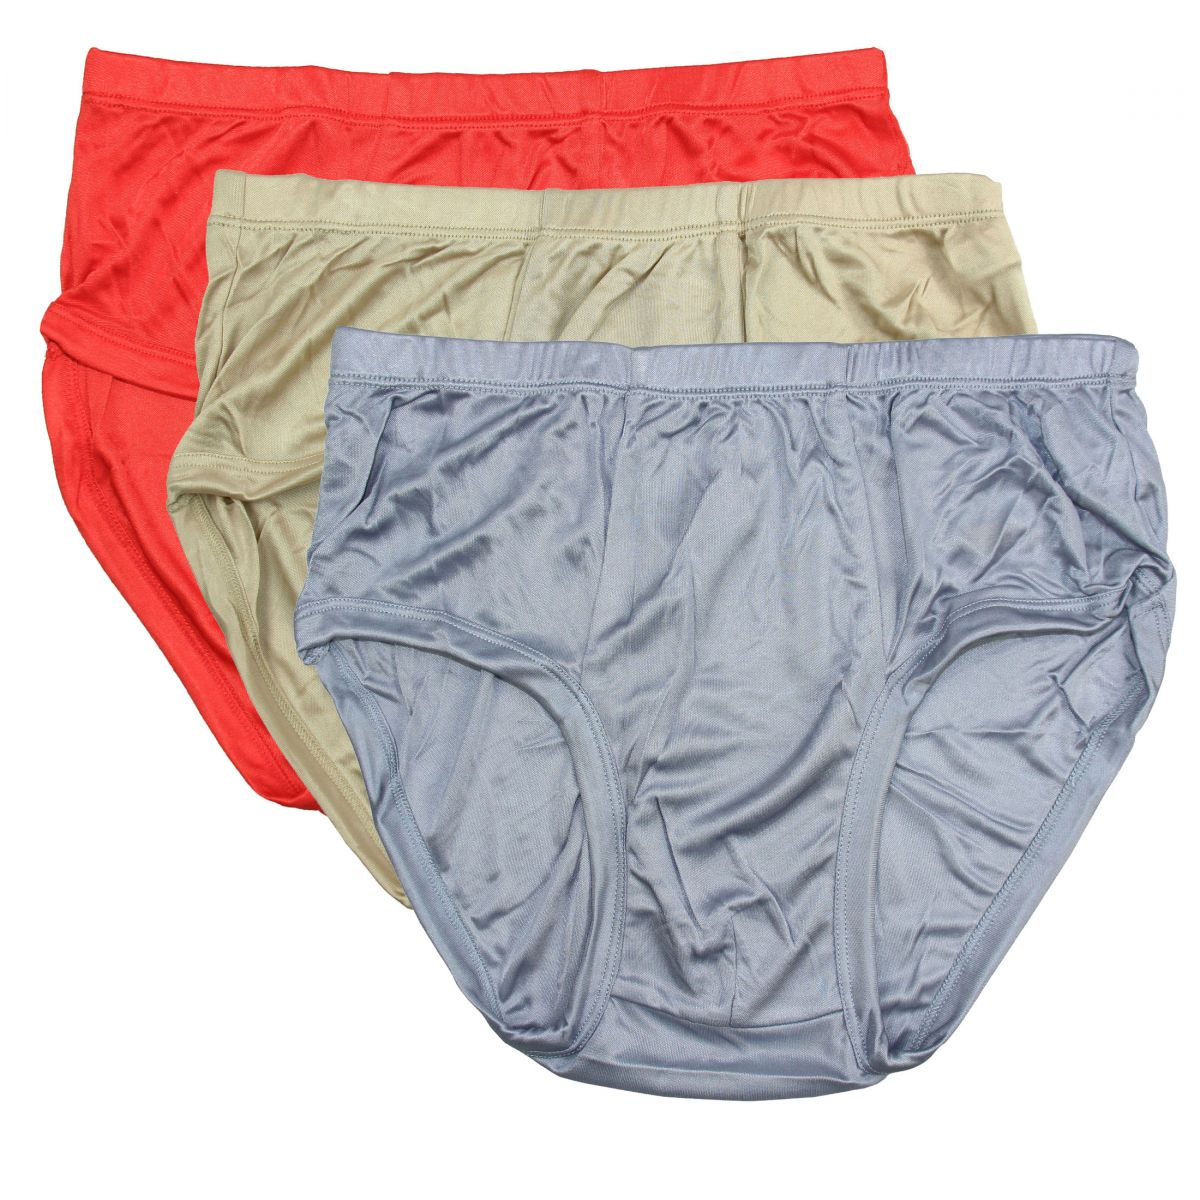 Pure Silk Knit Mens Thong Bulge Solid Brief US Size S M L XL XXL